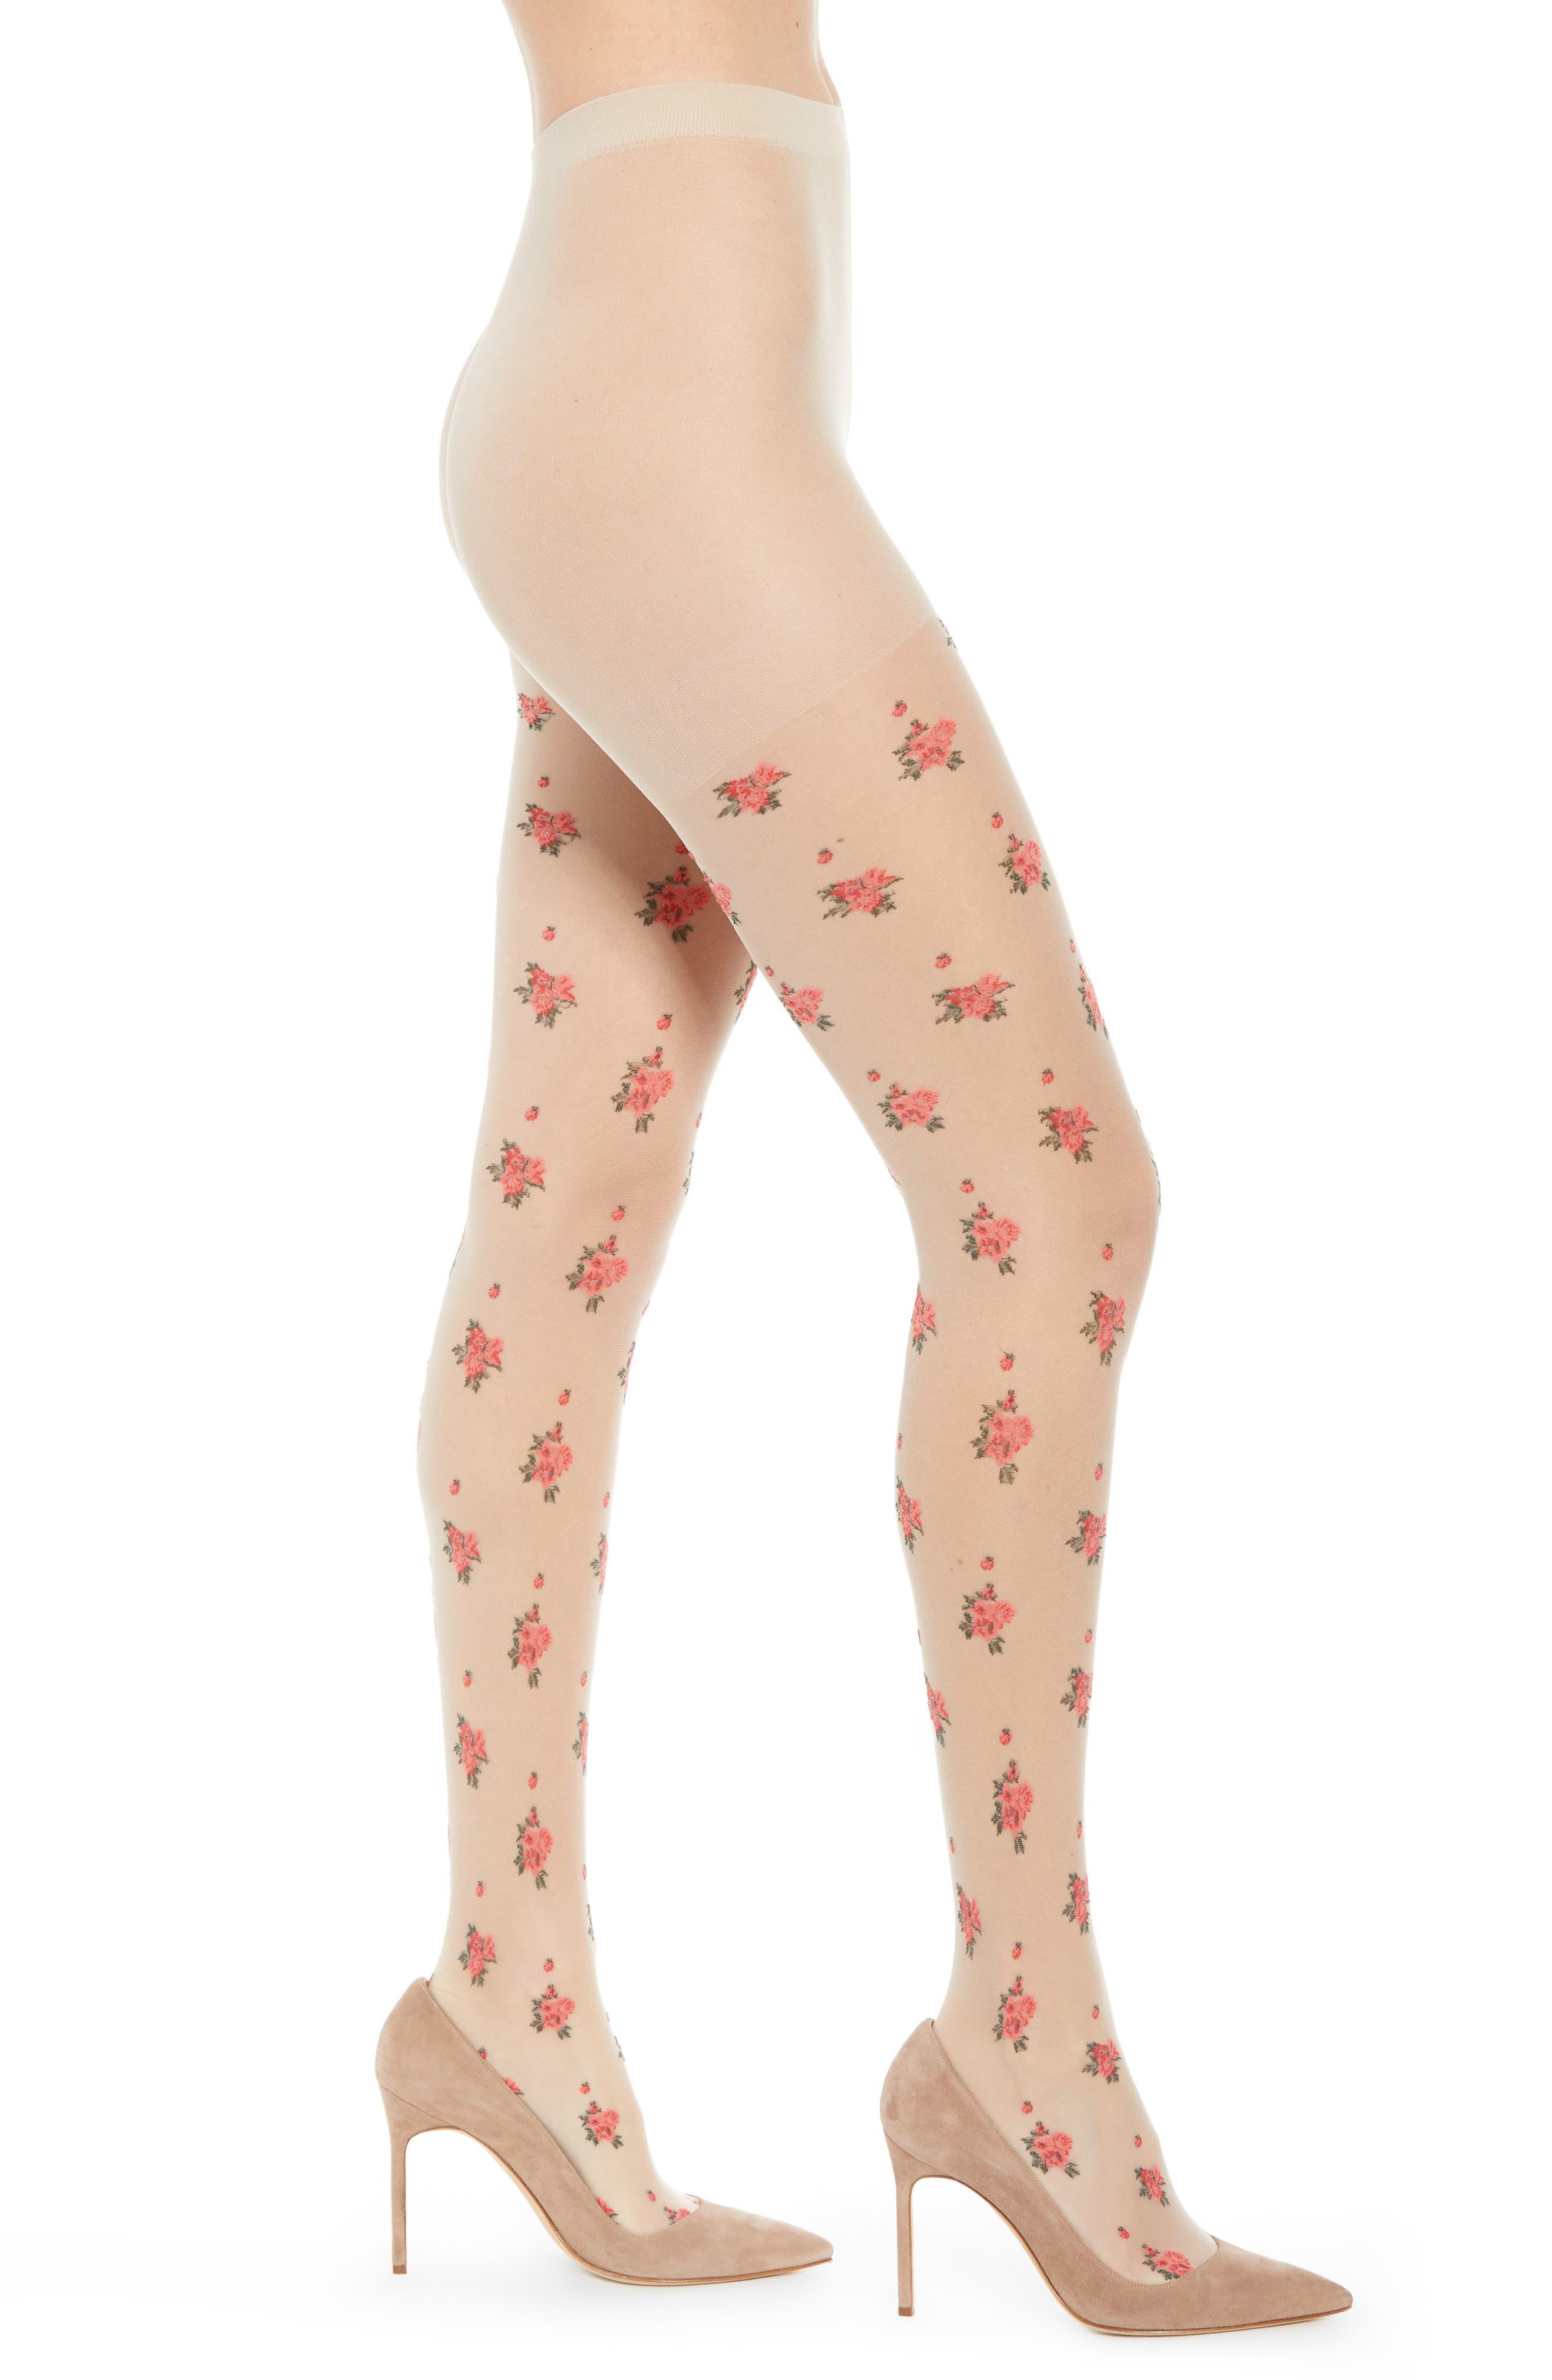 Victorian Stockings, Socks, Hosiery, Tights Womens Nordstrom Sheer Floral Intarsia Tights Size MediumLarge - None $11.40 AT vintagedancer.com